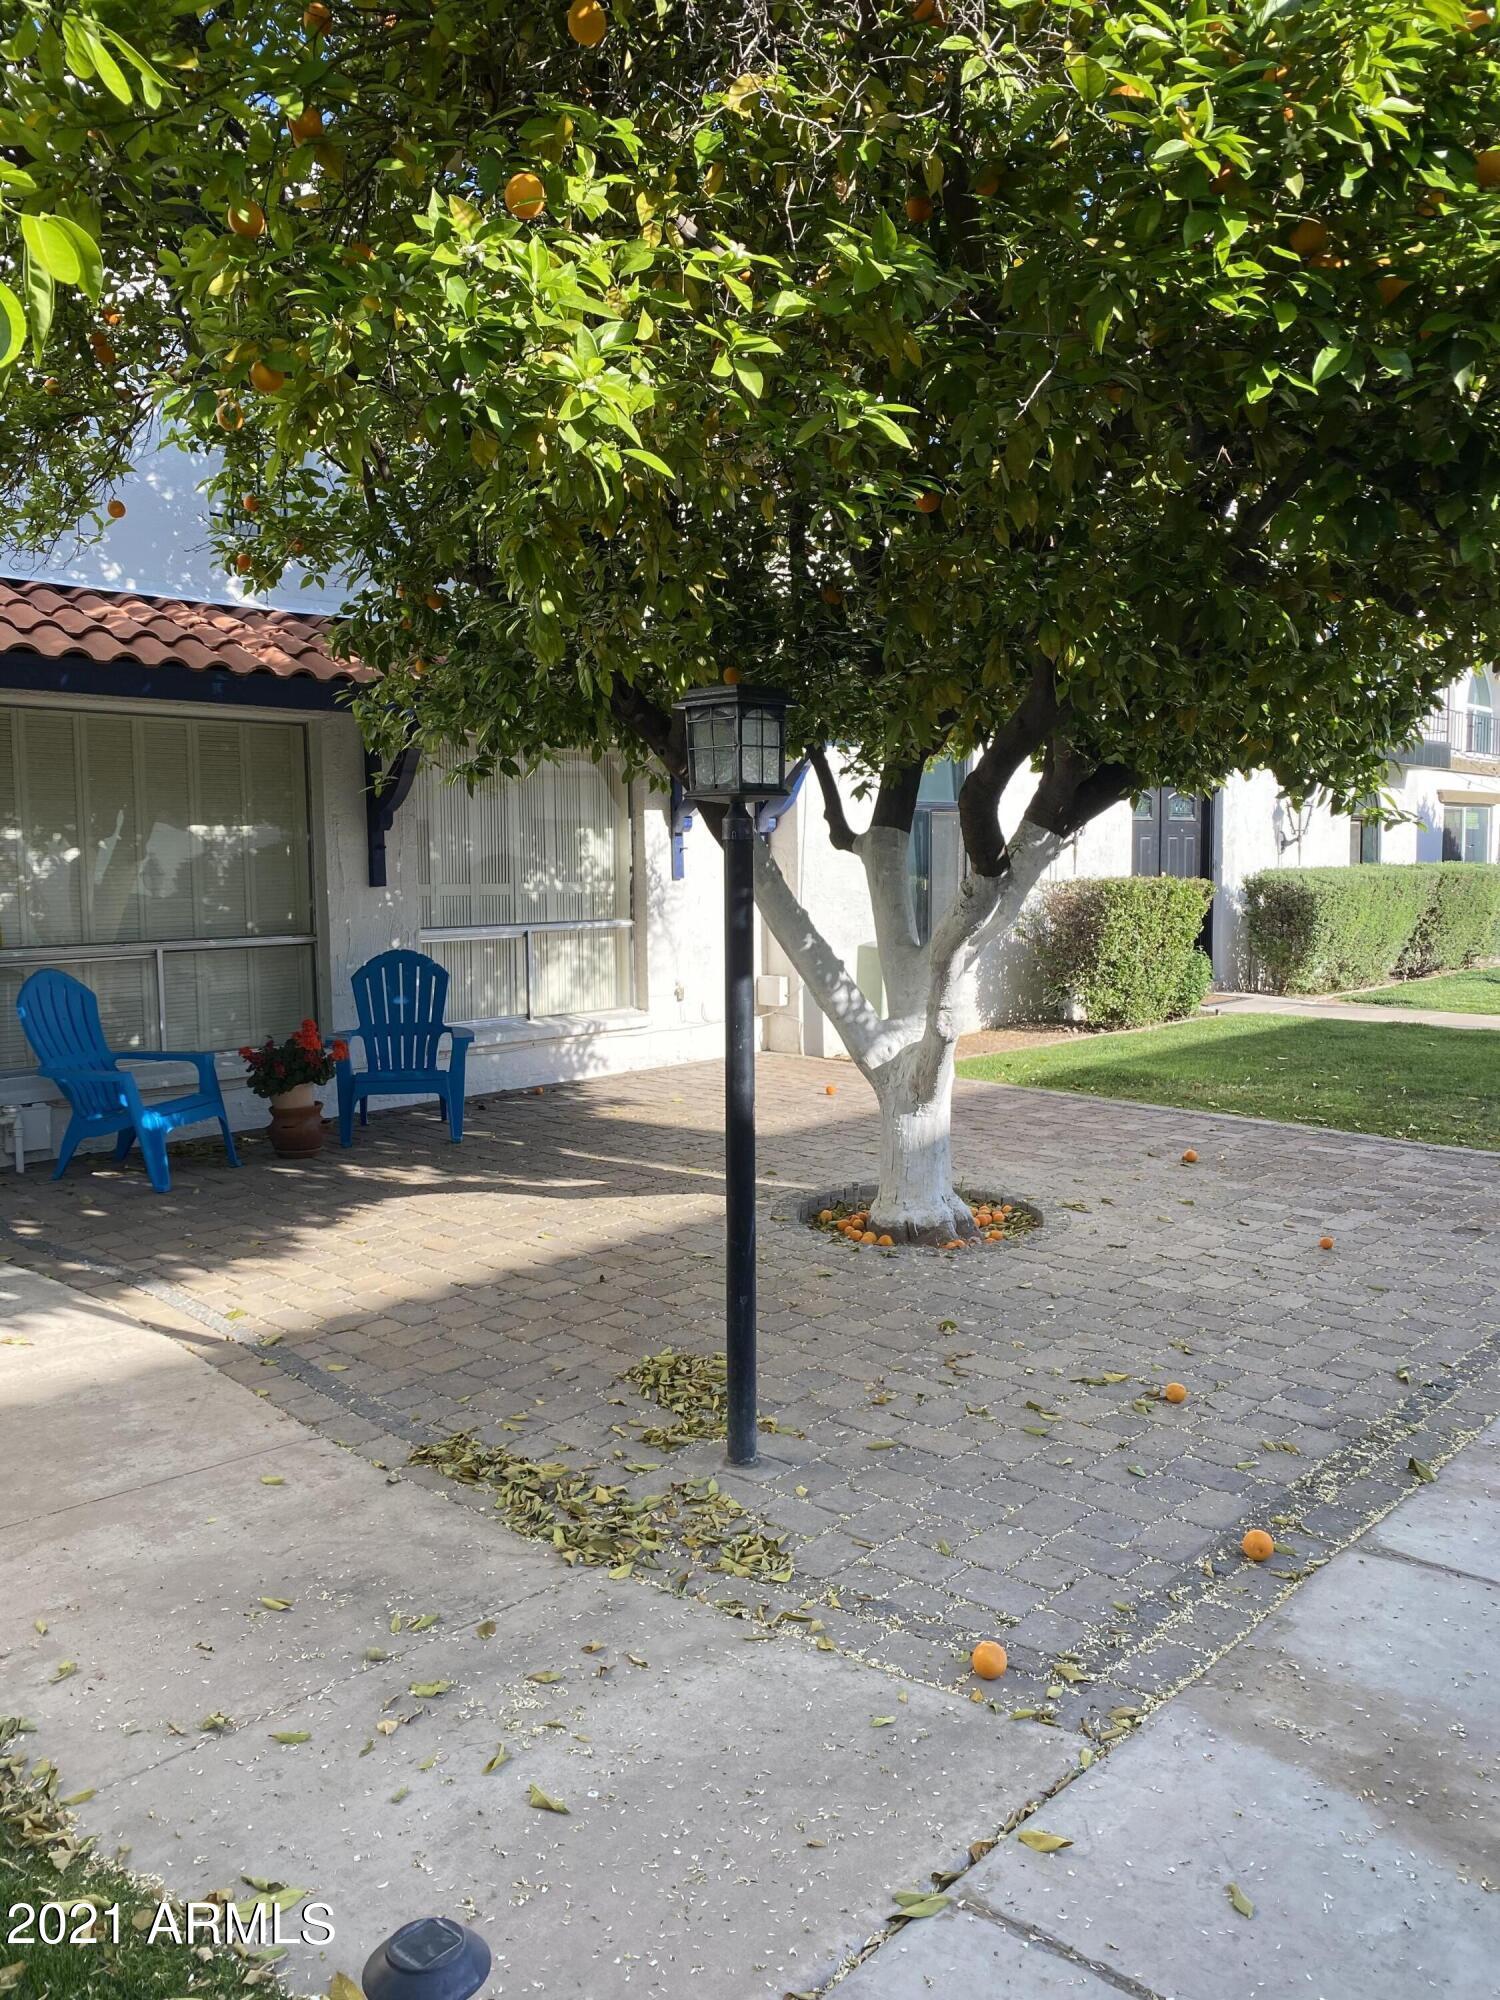 7744 E CAMELBACK Road, Scottsdale, AZ 85251, 2 Bedrooms Bedrooms, ,Residential Lease,For Rent,7744 E CAMELBACK Road,6218126